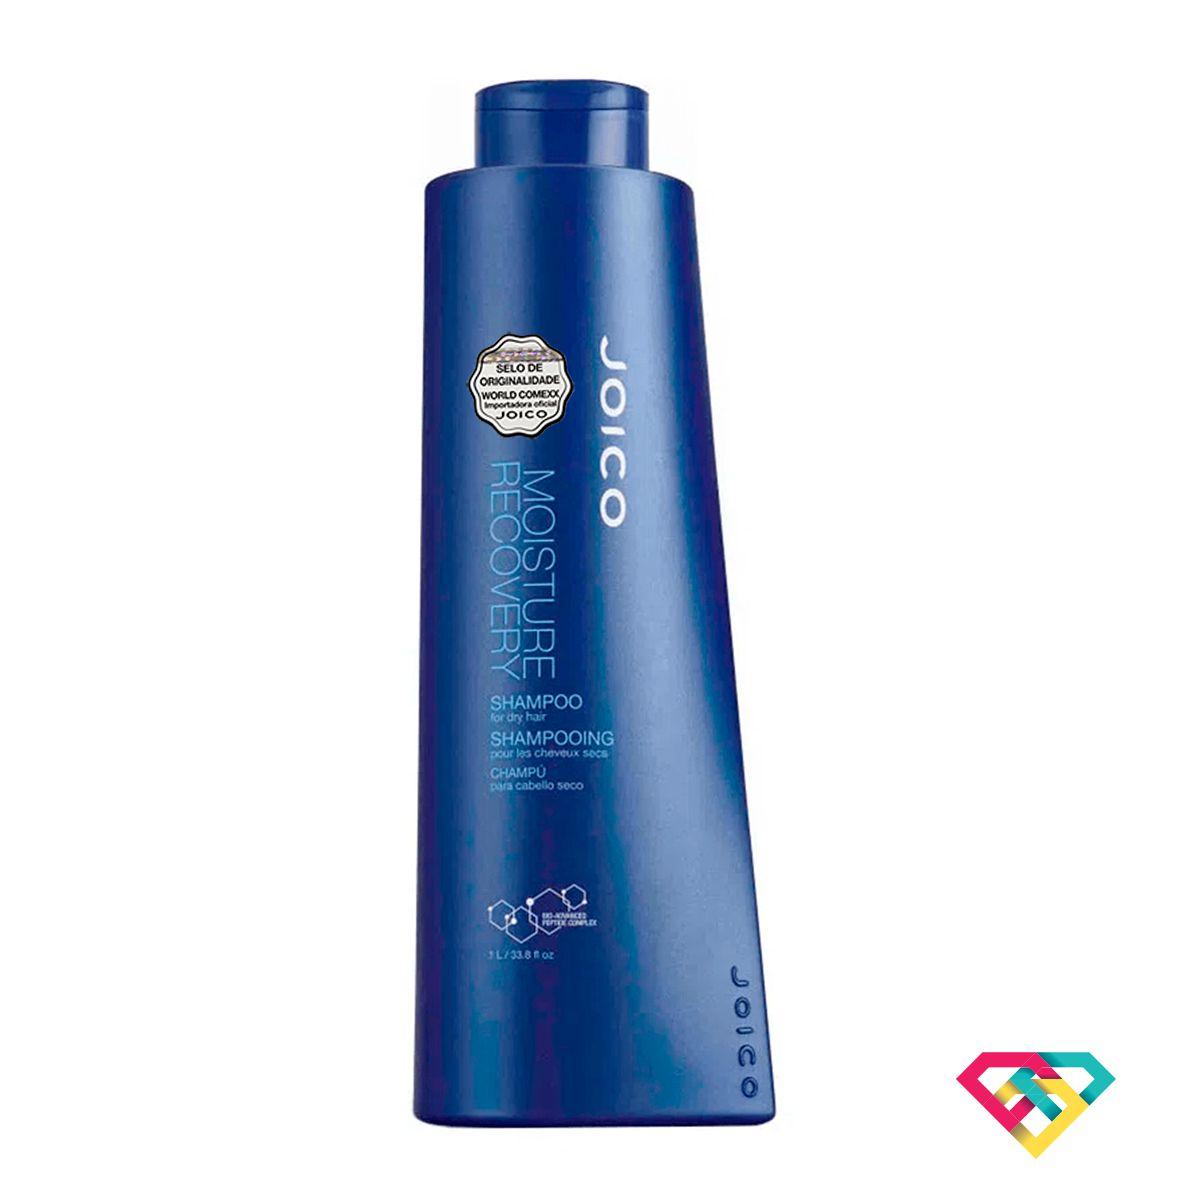 Shampoo Hidratante Joico Moisture Recovery 1000 ml  - Shine Shop Perfumes e Cosméticos